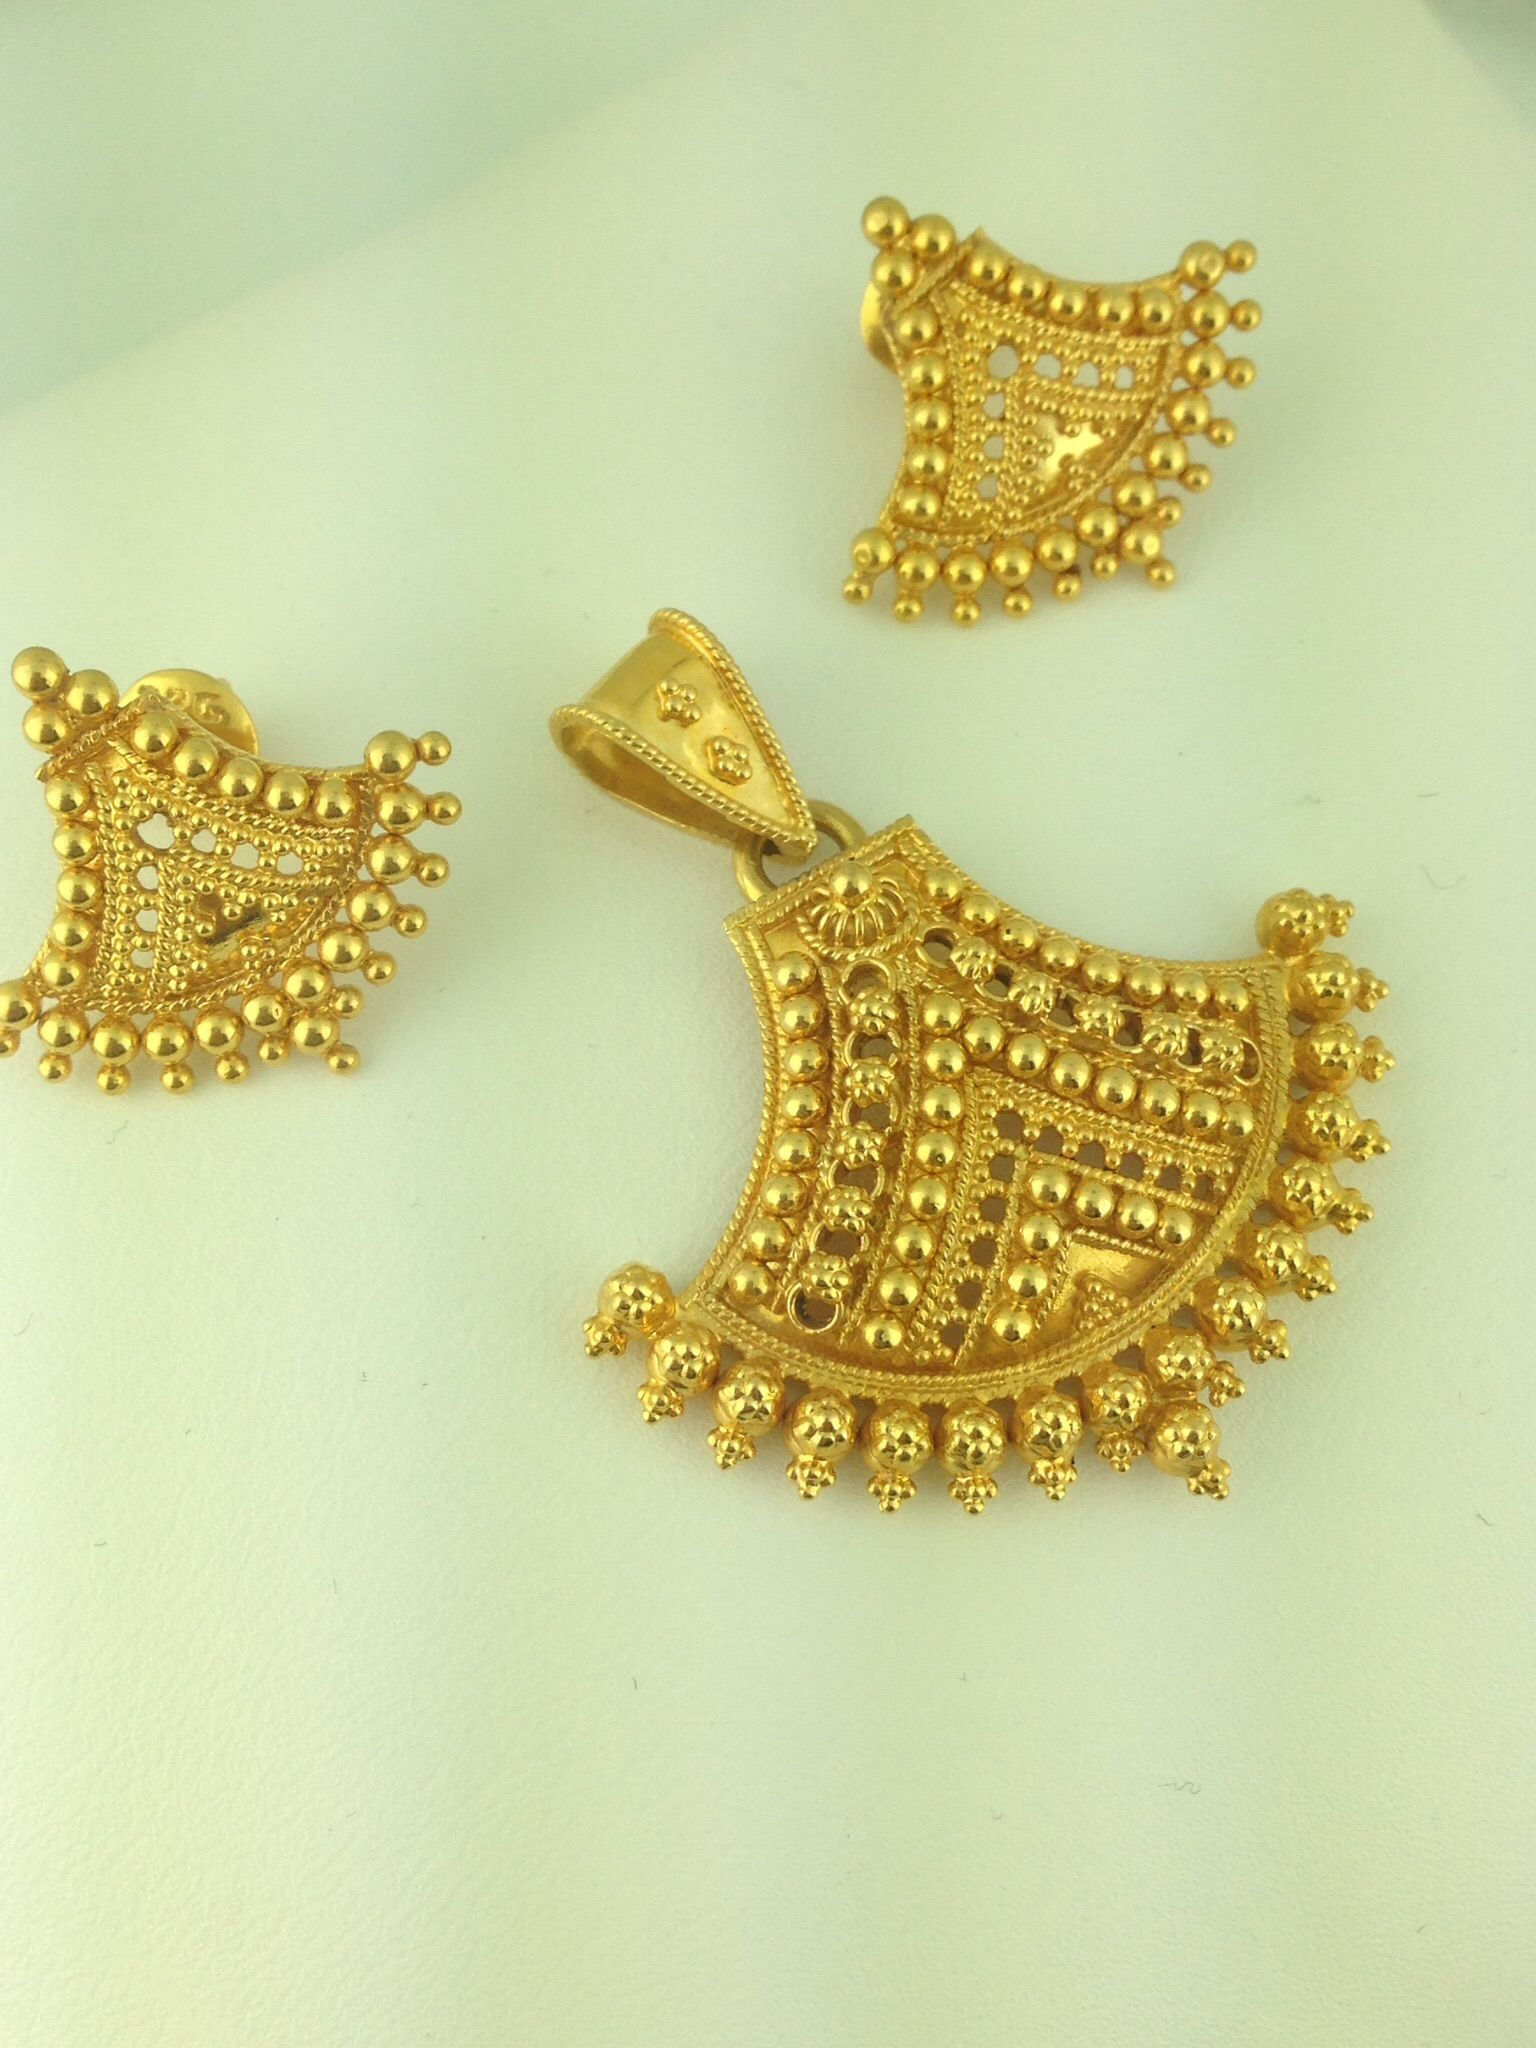 k gold pendant set grams Neck Pinterest Pendant set